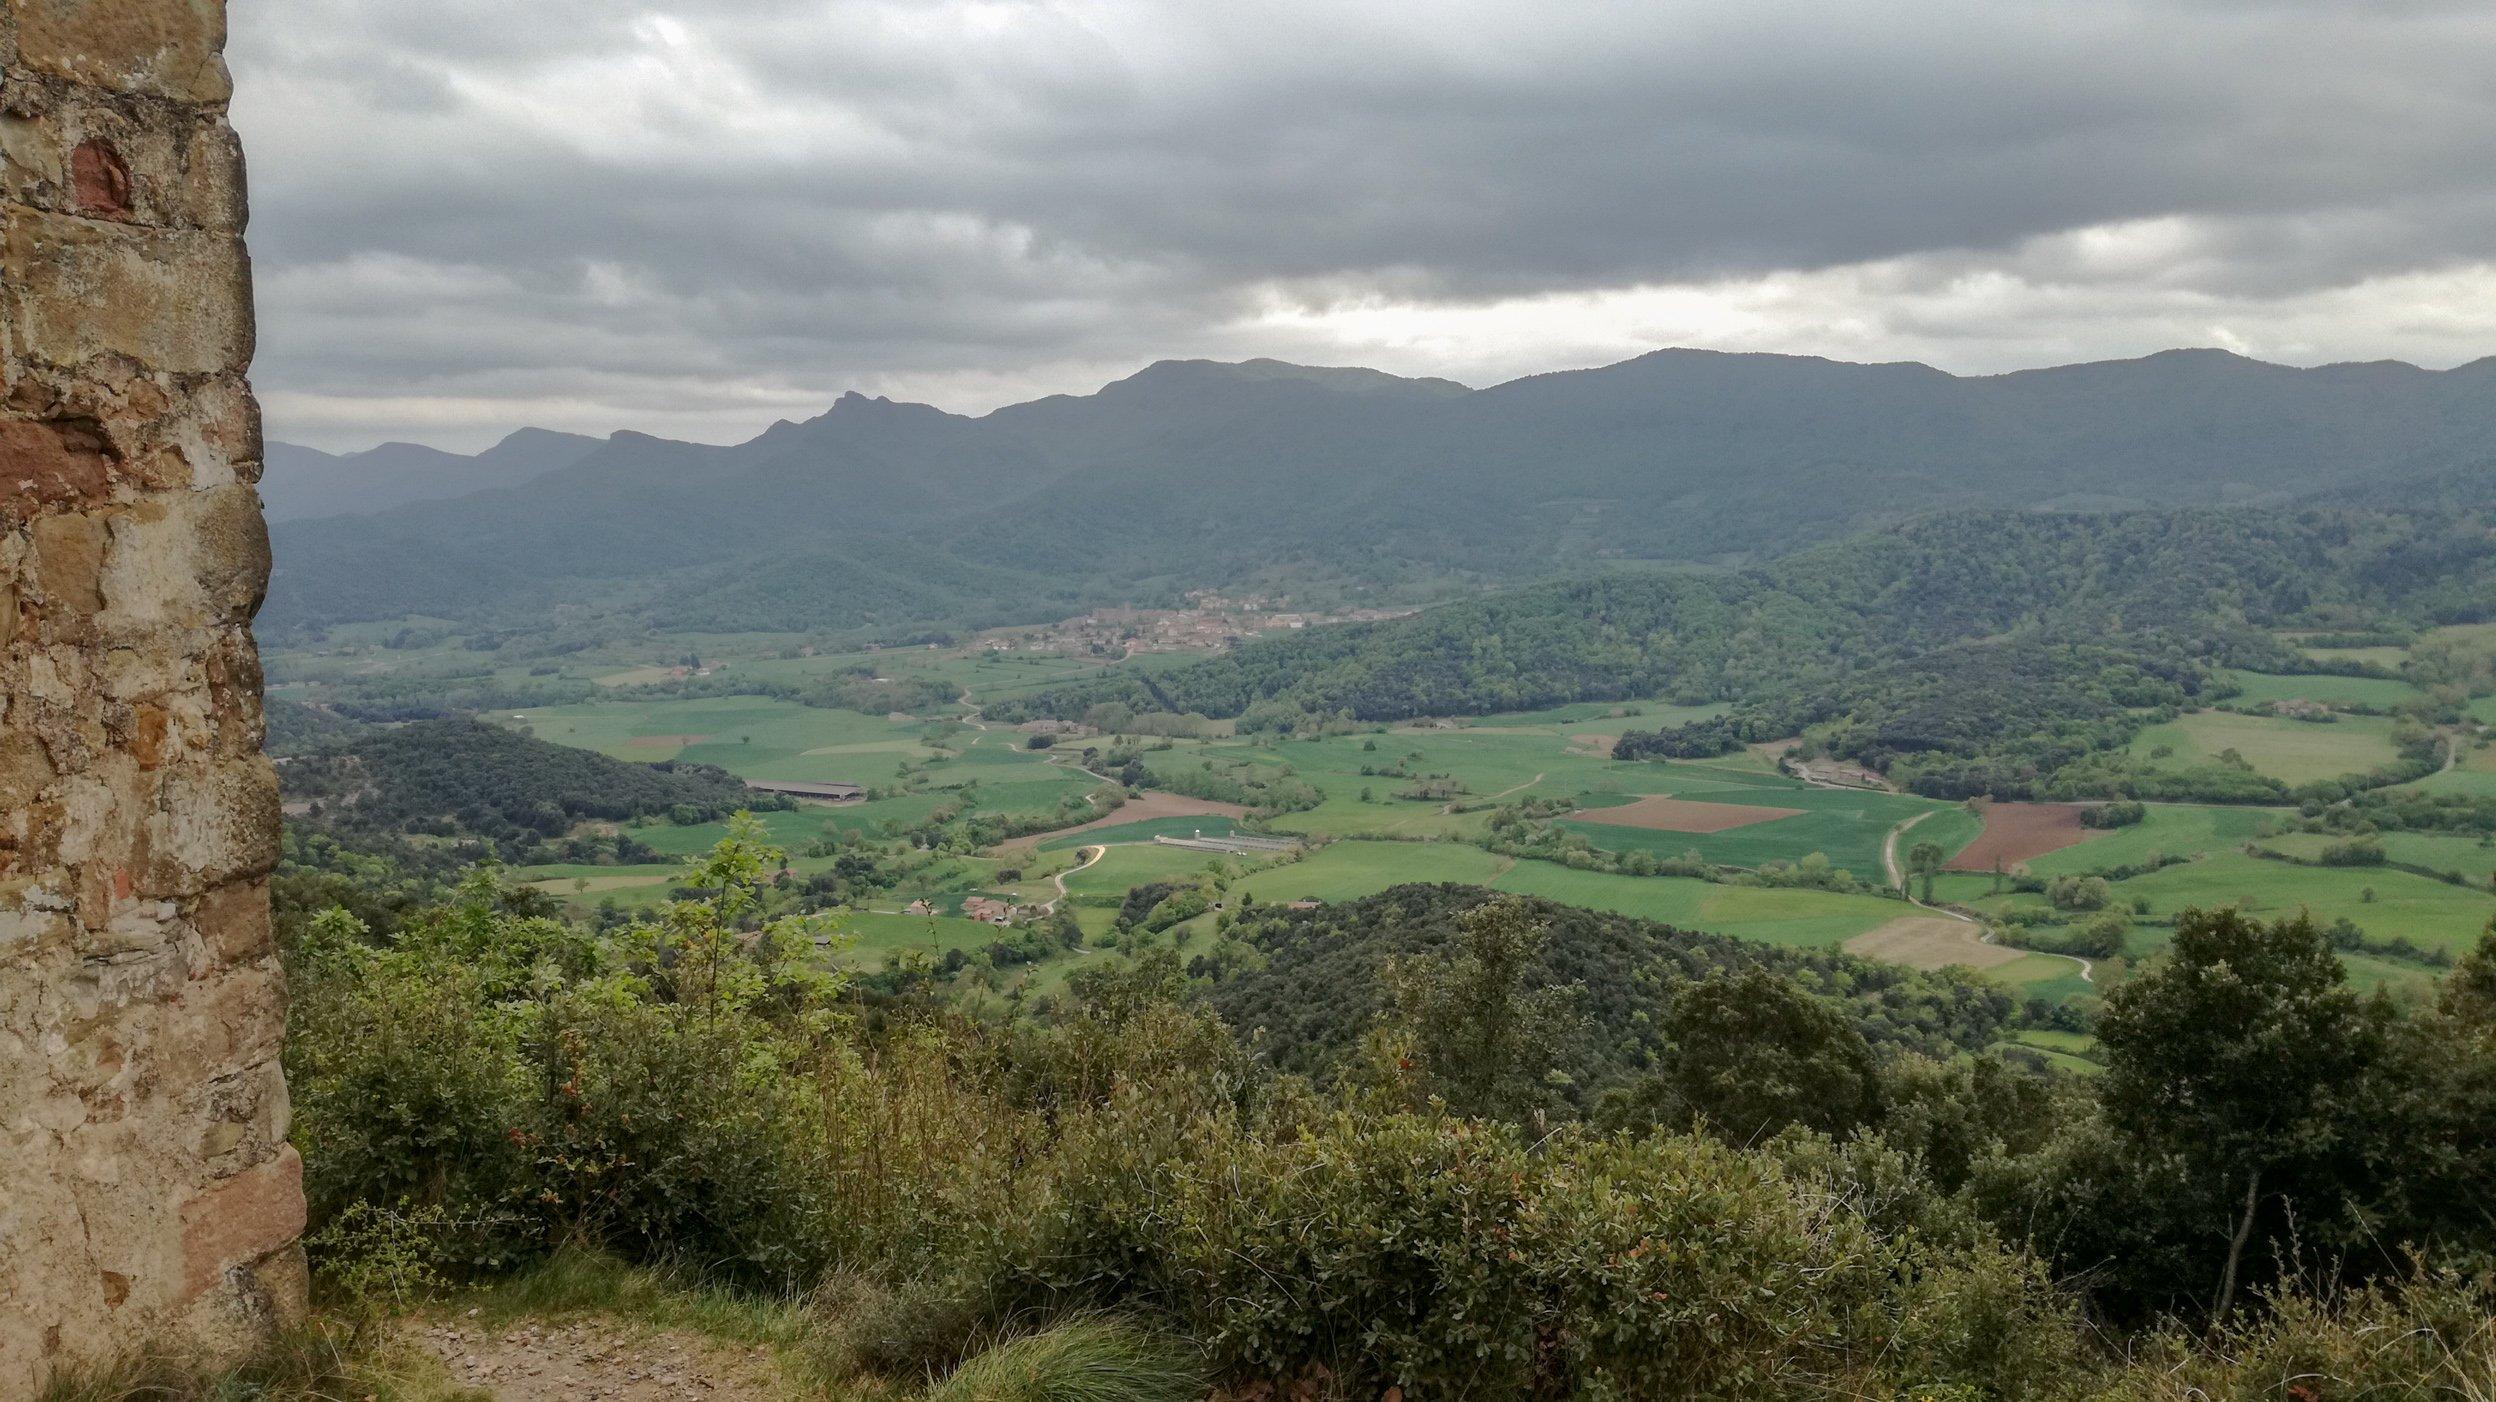 Garrotxa Hike trail, looking down at extinct volcanos from the Sant Abdó i Sant Senen de Santa Pau chapel on Coll de Boixeda hill